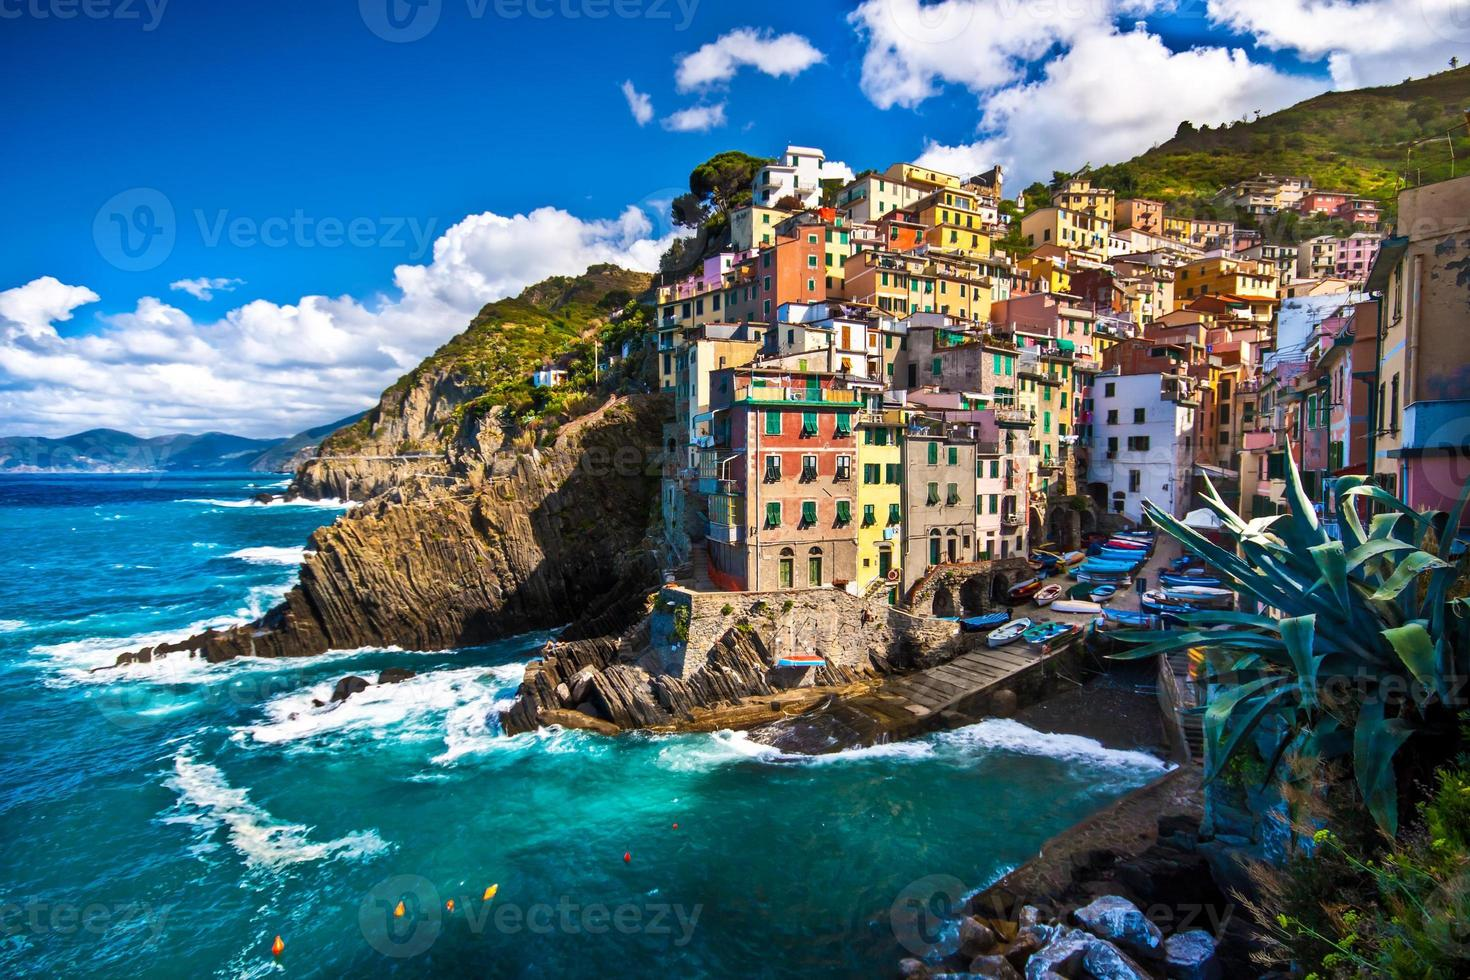 Village de pêcheurs de Riomaggiore à Cinque Terre, Italie photo